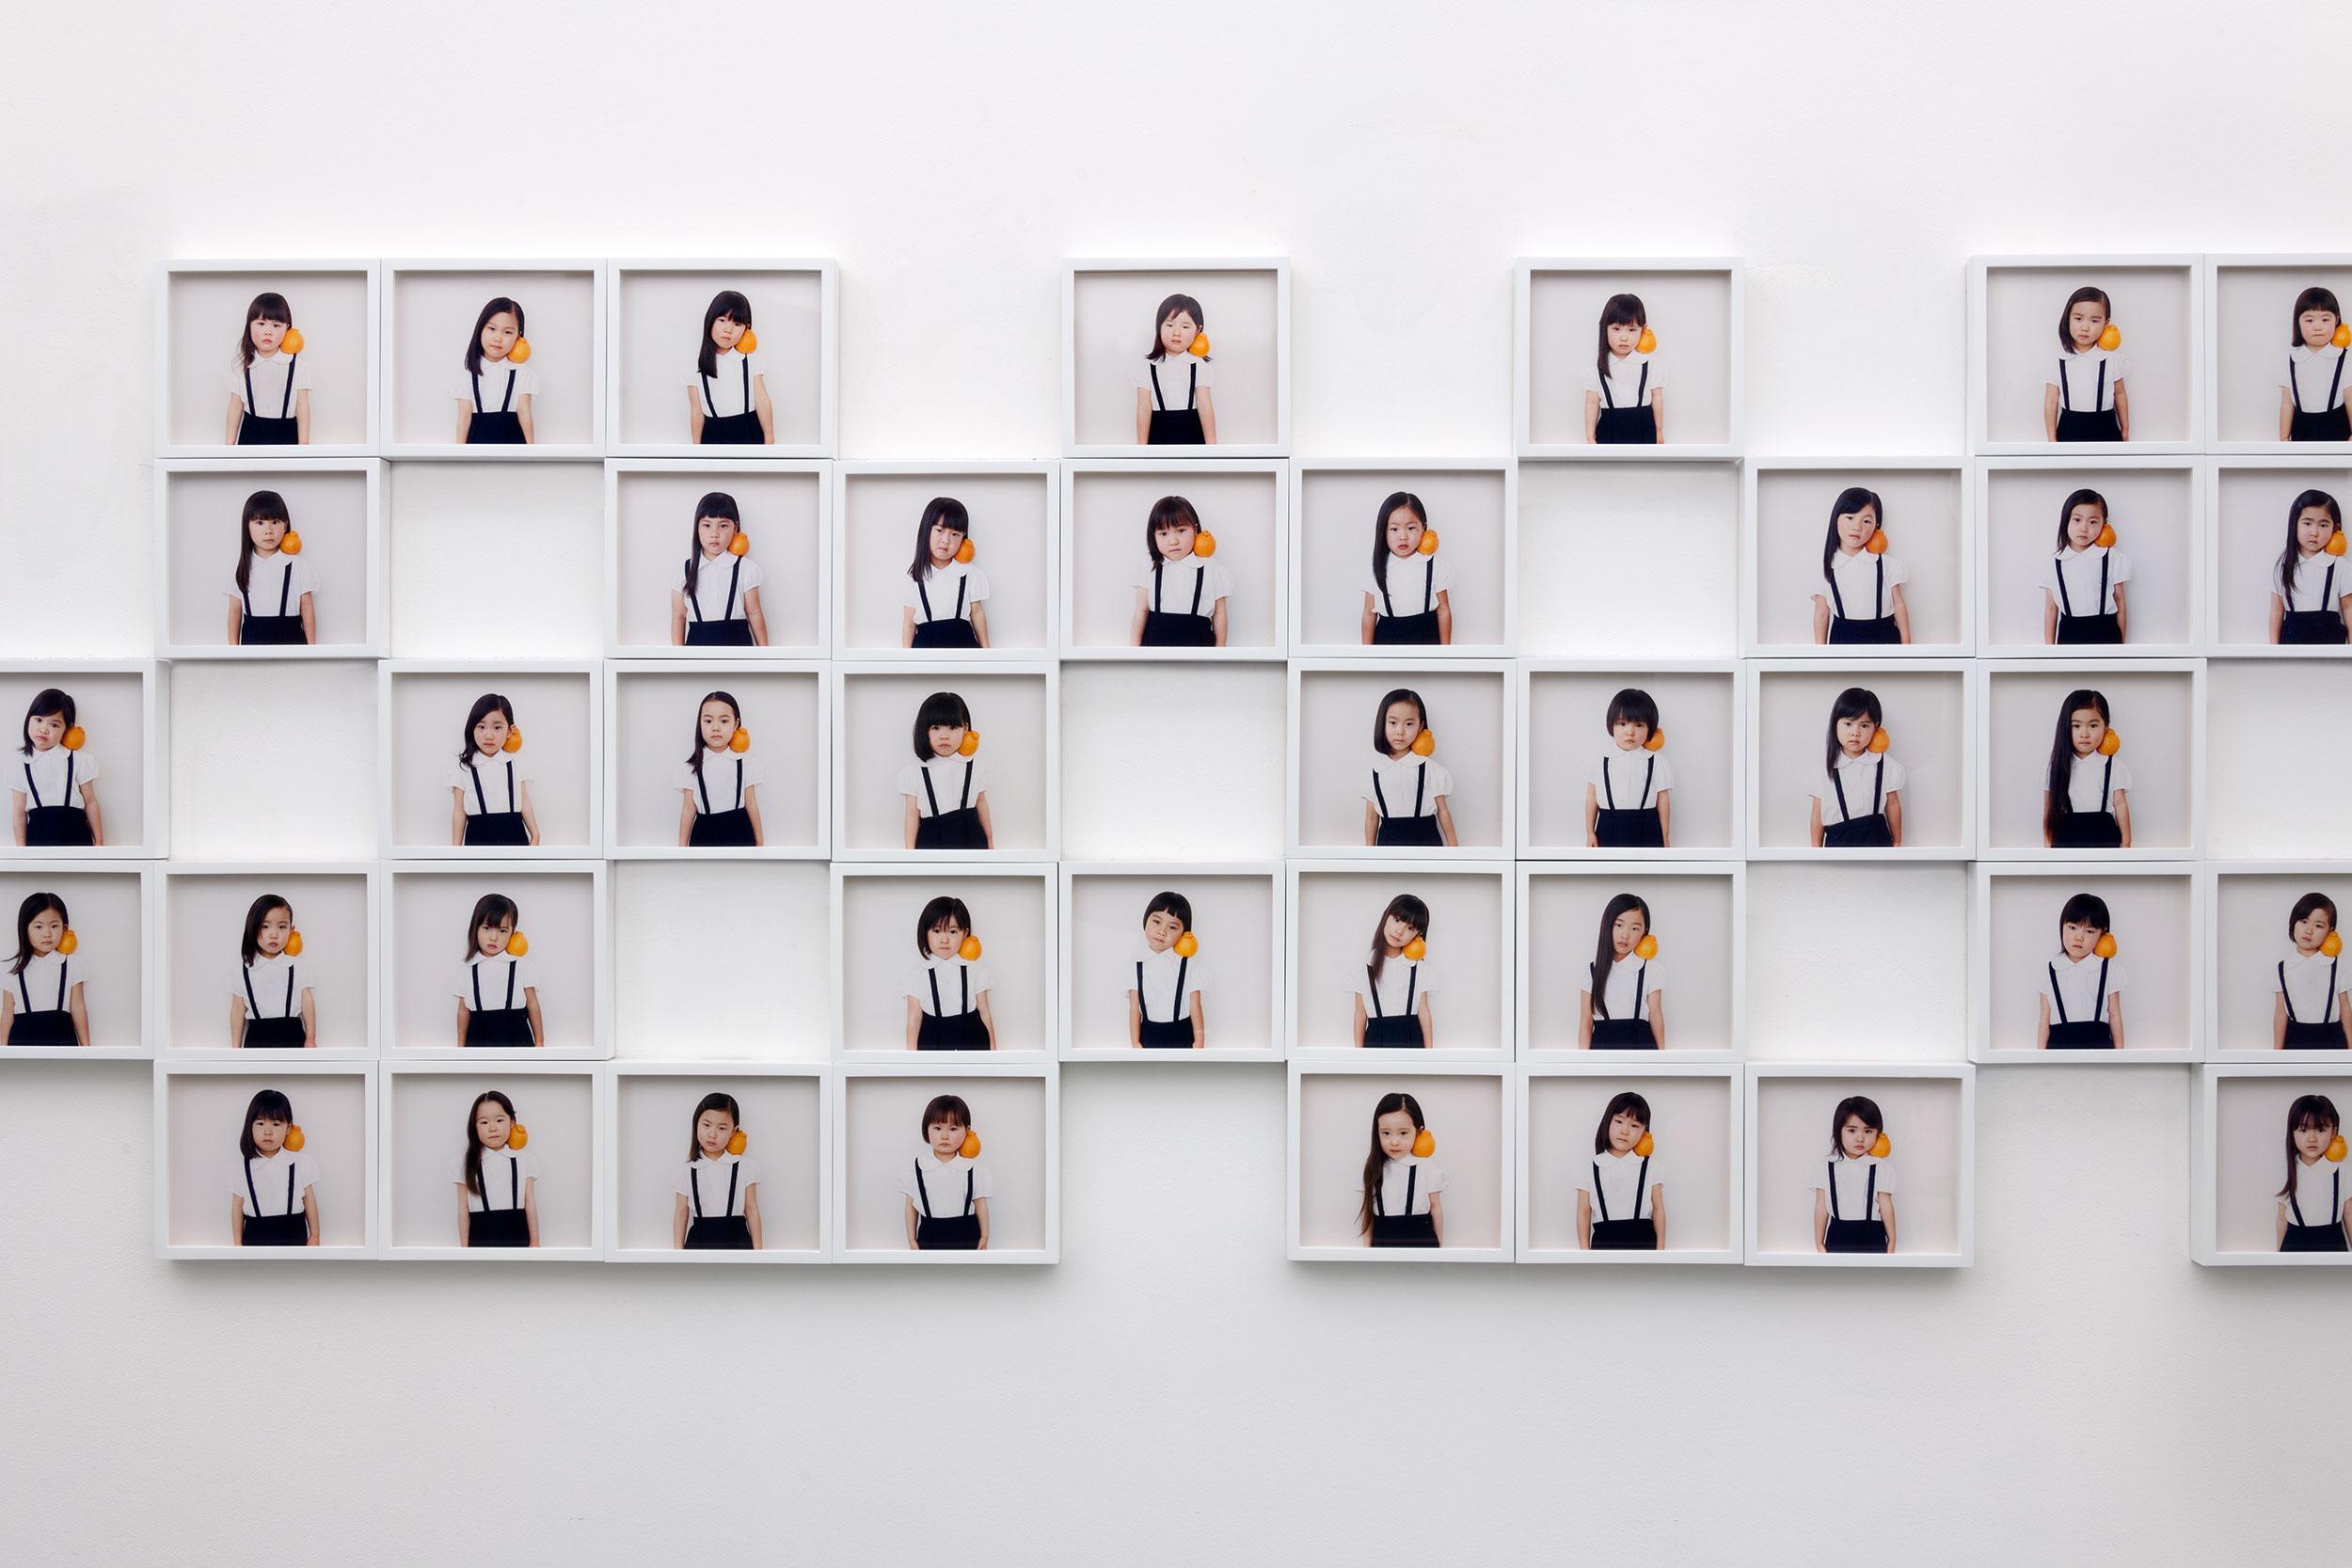 Osamu Yokonami,  1000 Children: Sumo Mandarin (installation view) , 2018  (75) digital pigment prints, 146 x 168 mm each (approx. 5.5 x 6.6 in each), framed, $240 each   Inquire